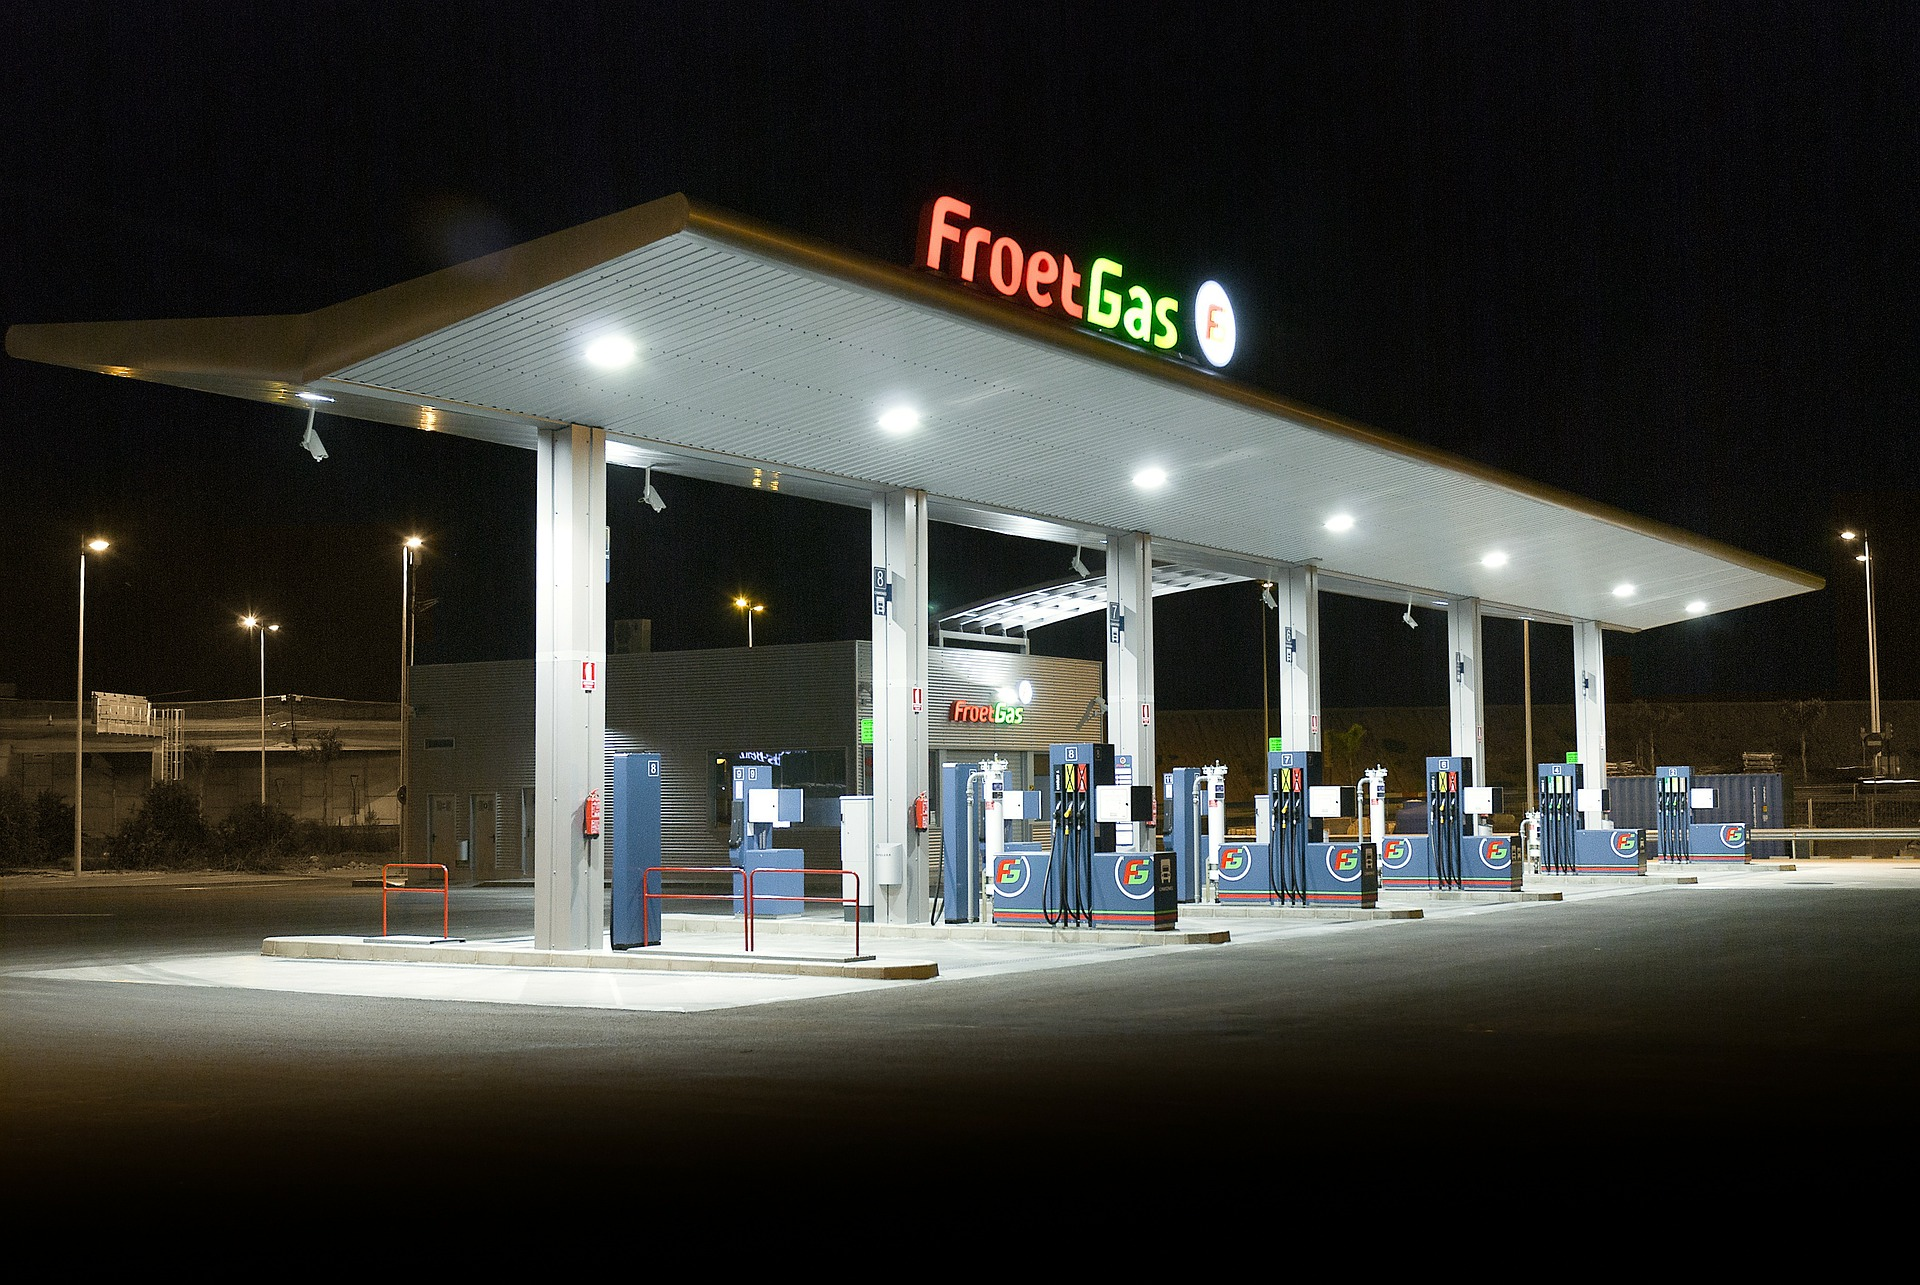 Gas station, generic